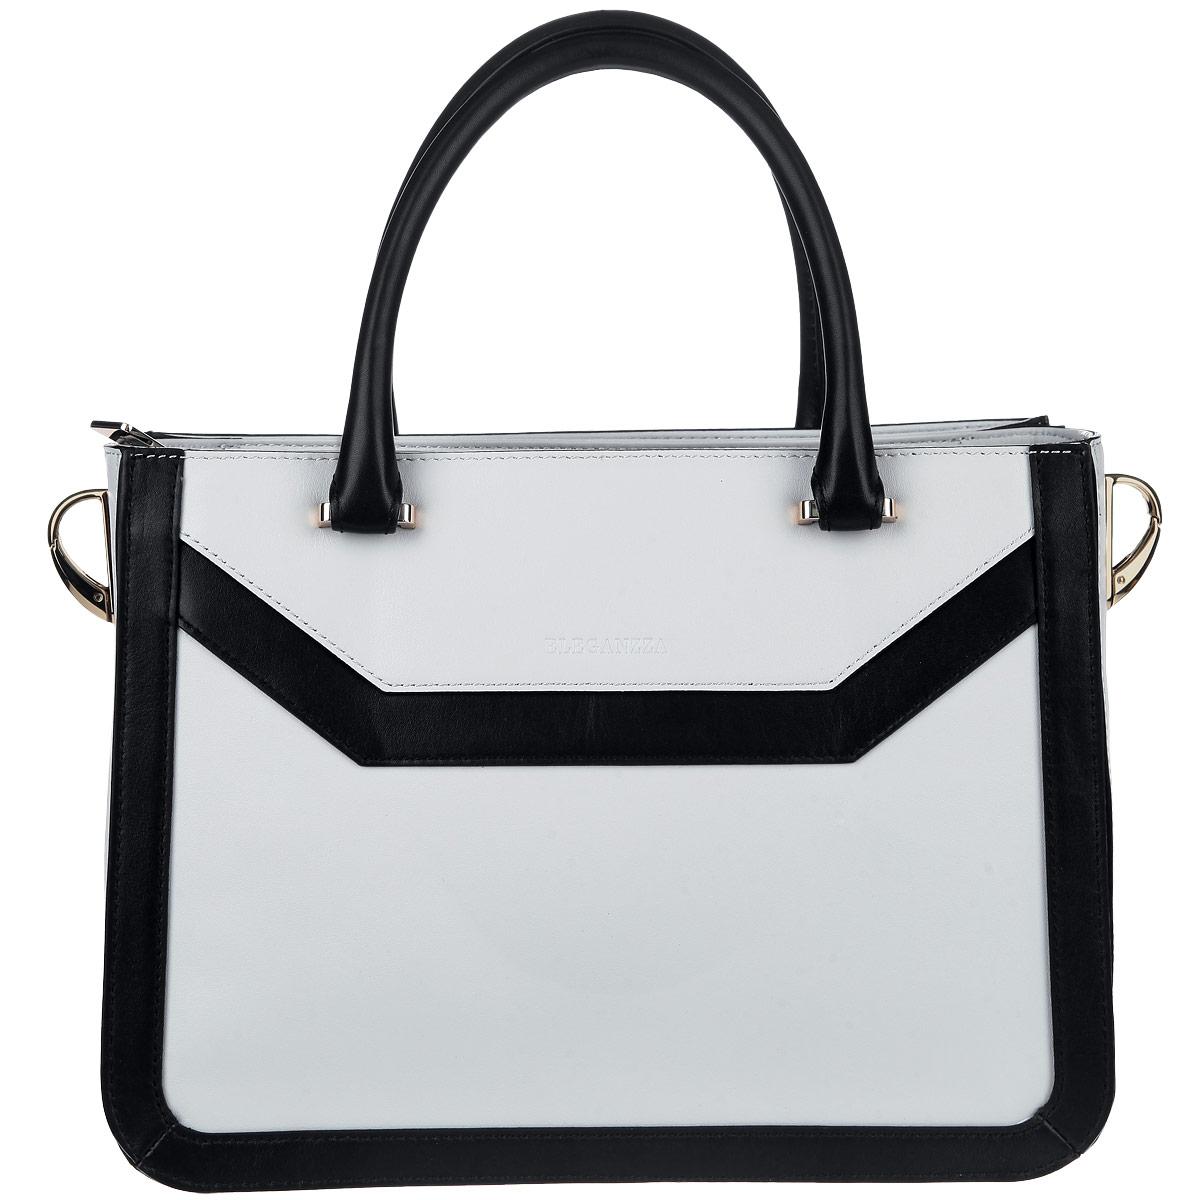 Сумка женская Eleganzza, цвет: серый, черный. ZT-36156AGZT-36156AG